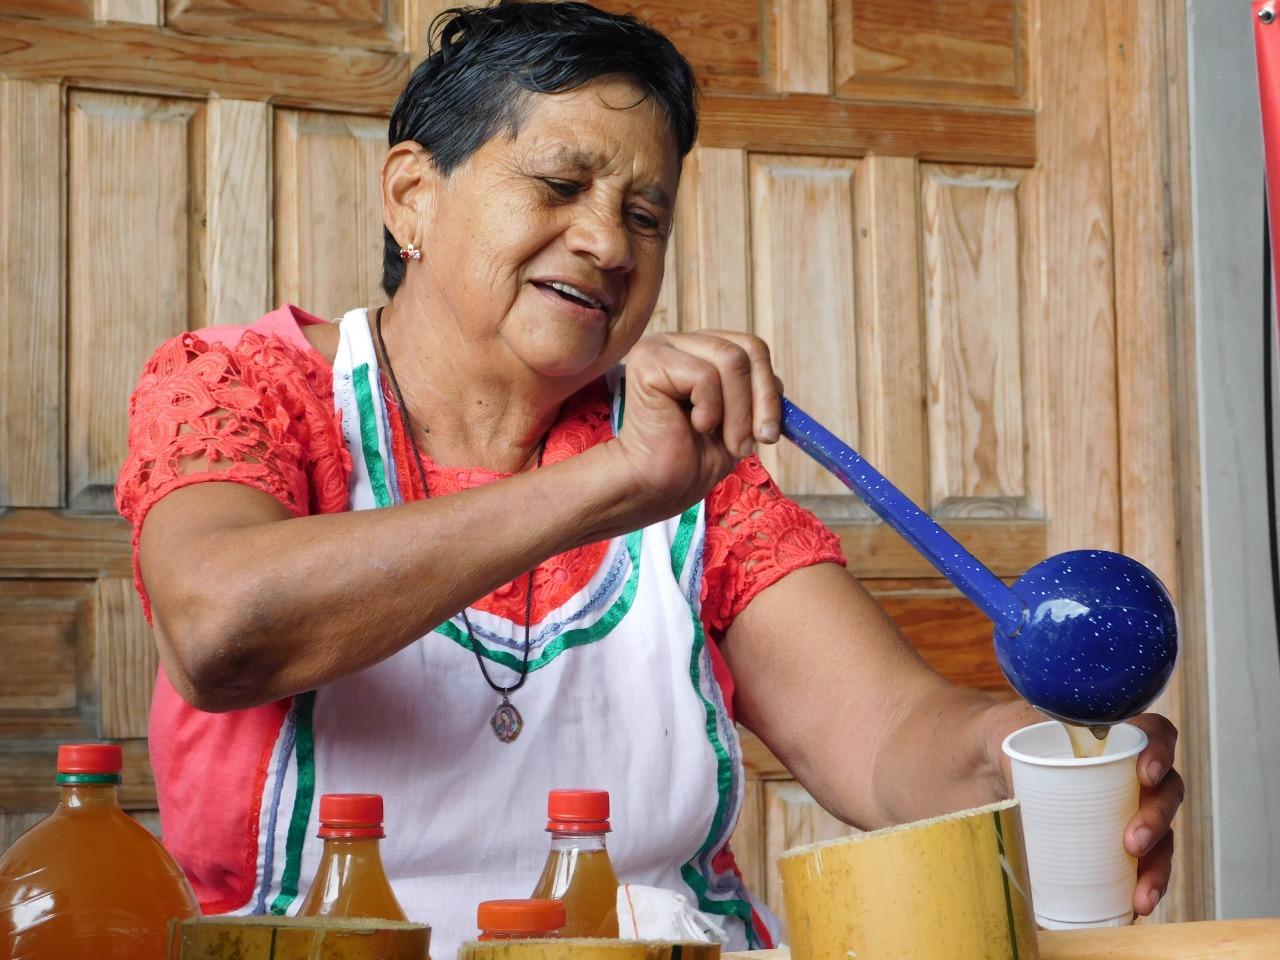 Diferente tipo de bebidas fueron degustadas en Cantarrana